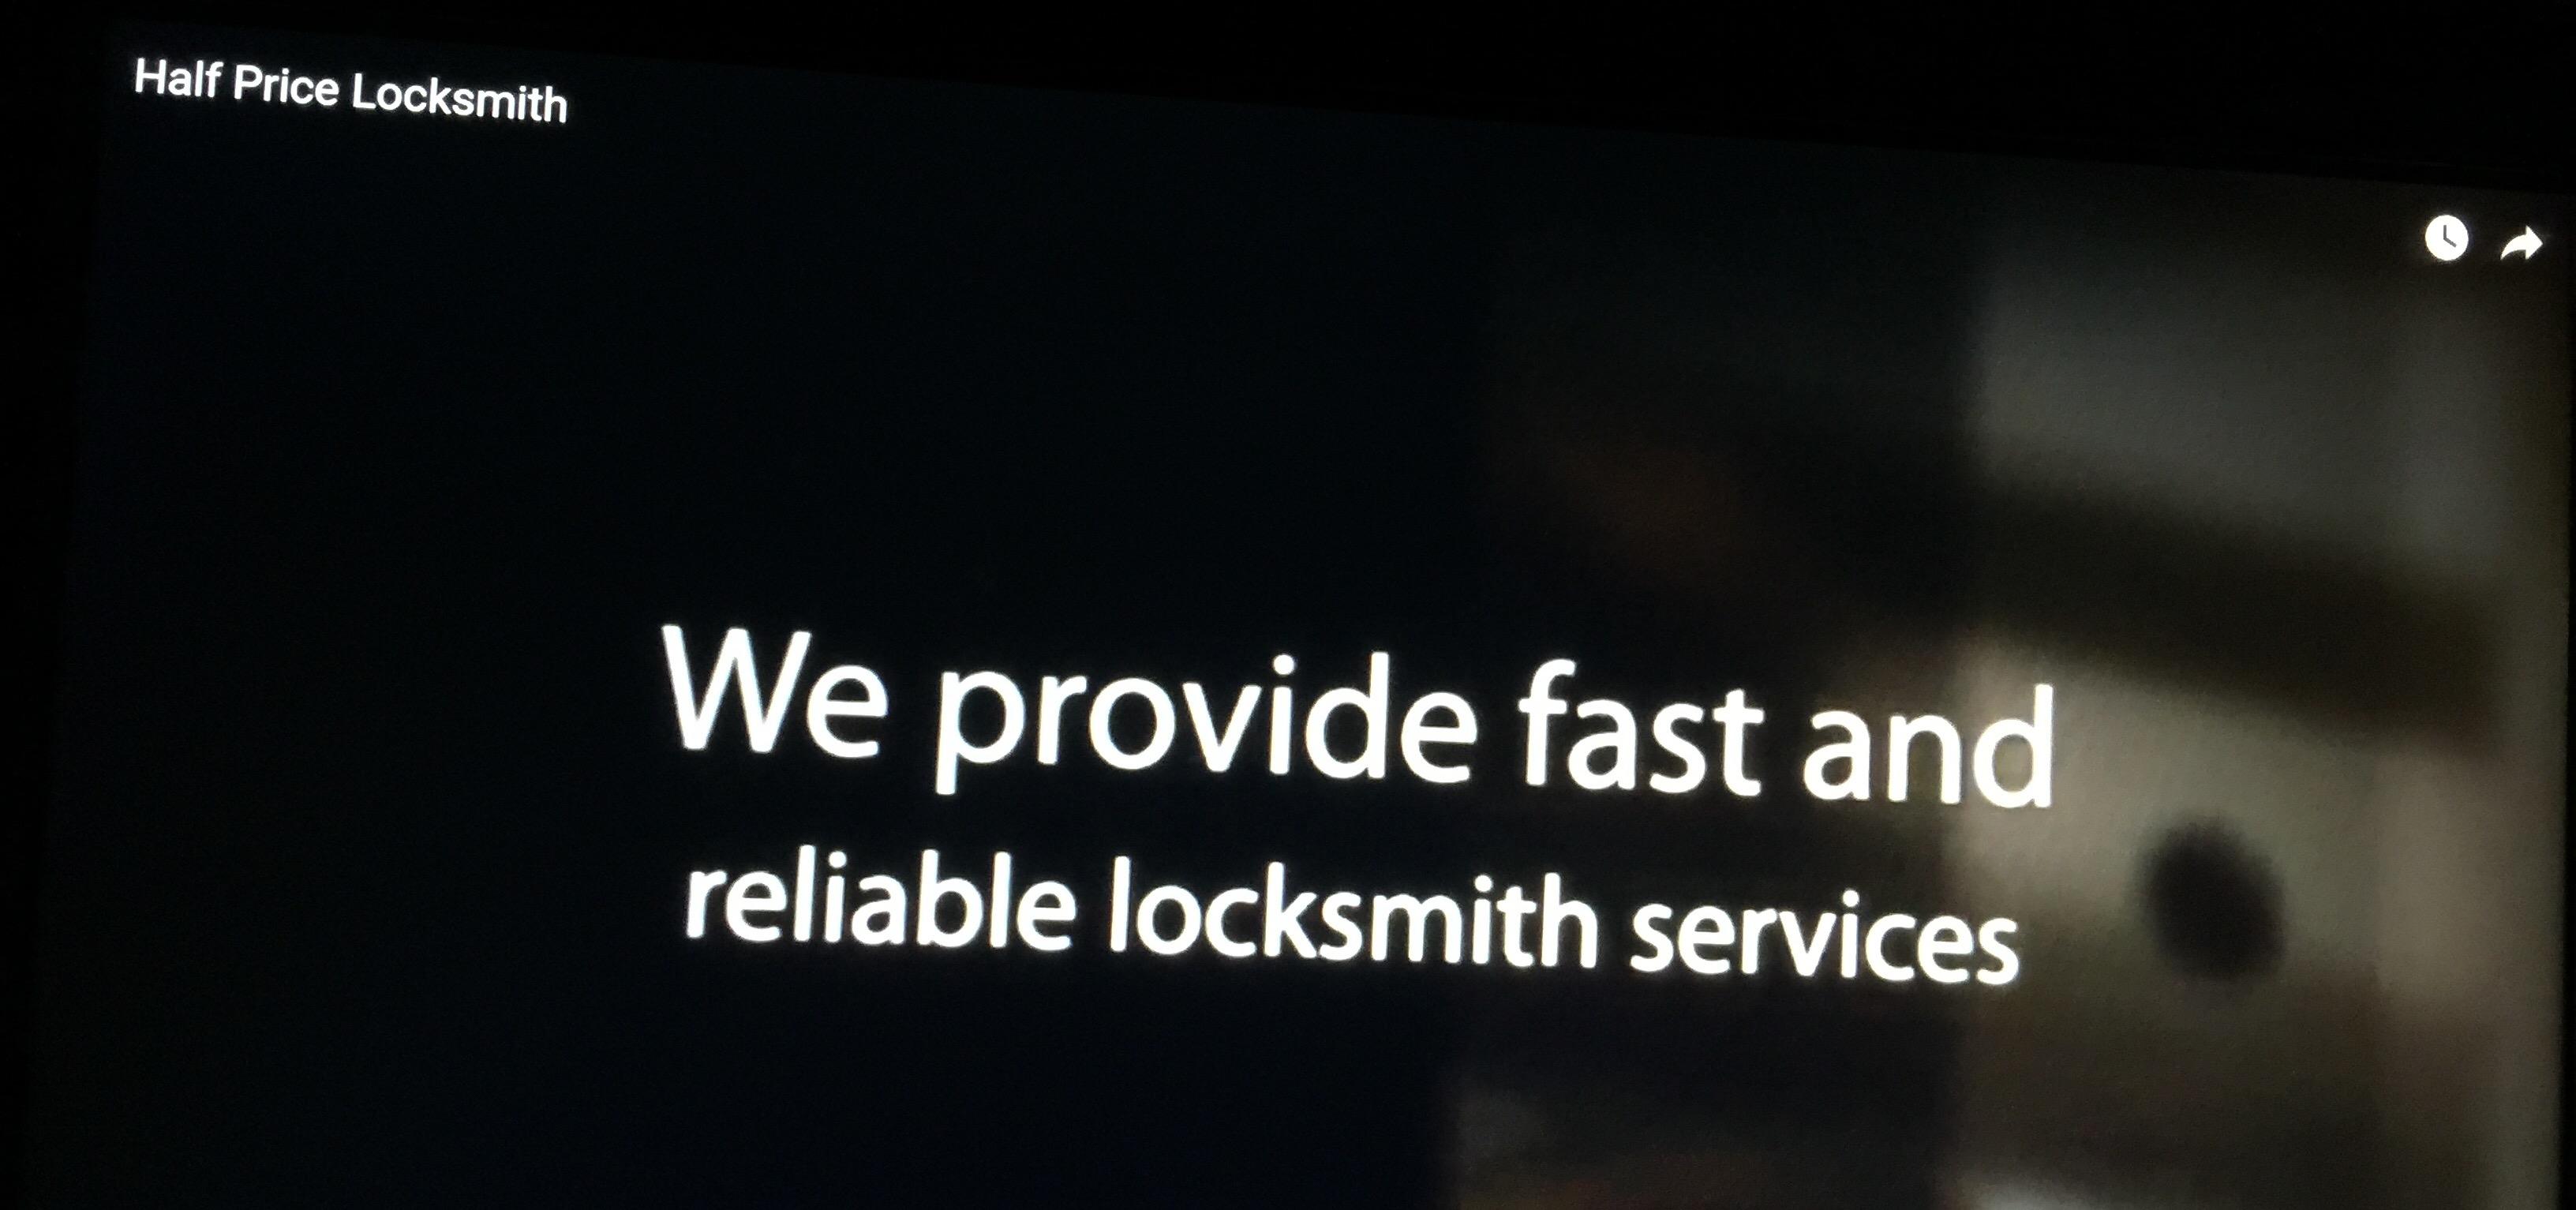 Half Price Locksmith image 18